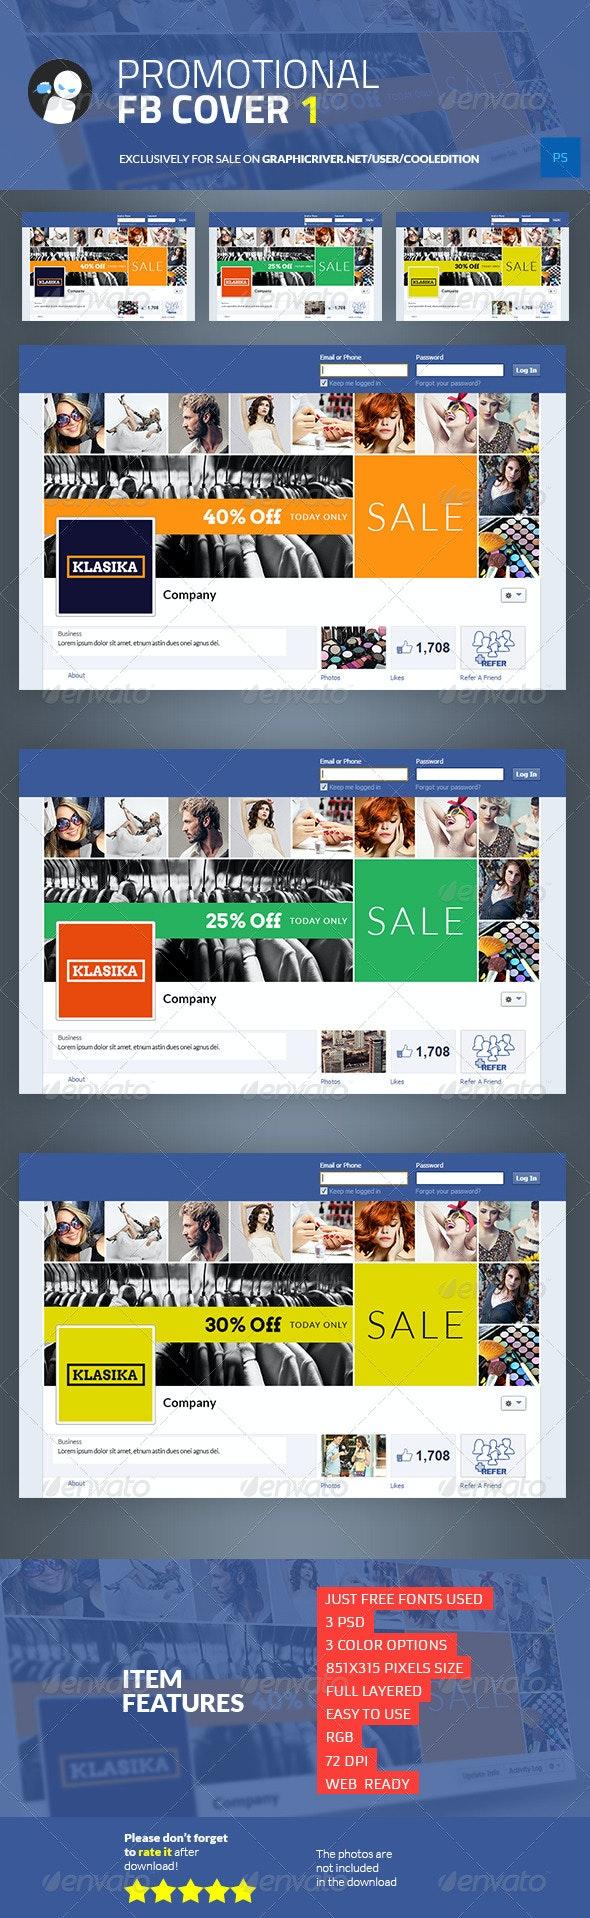 Promotional Facebook Cover 1 - Facebook Timeline Covers Social Media